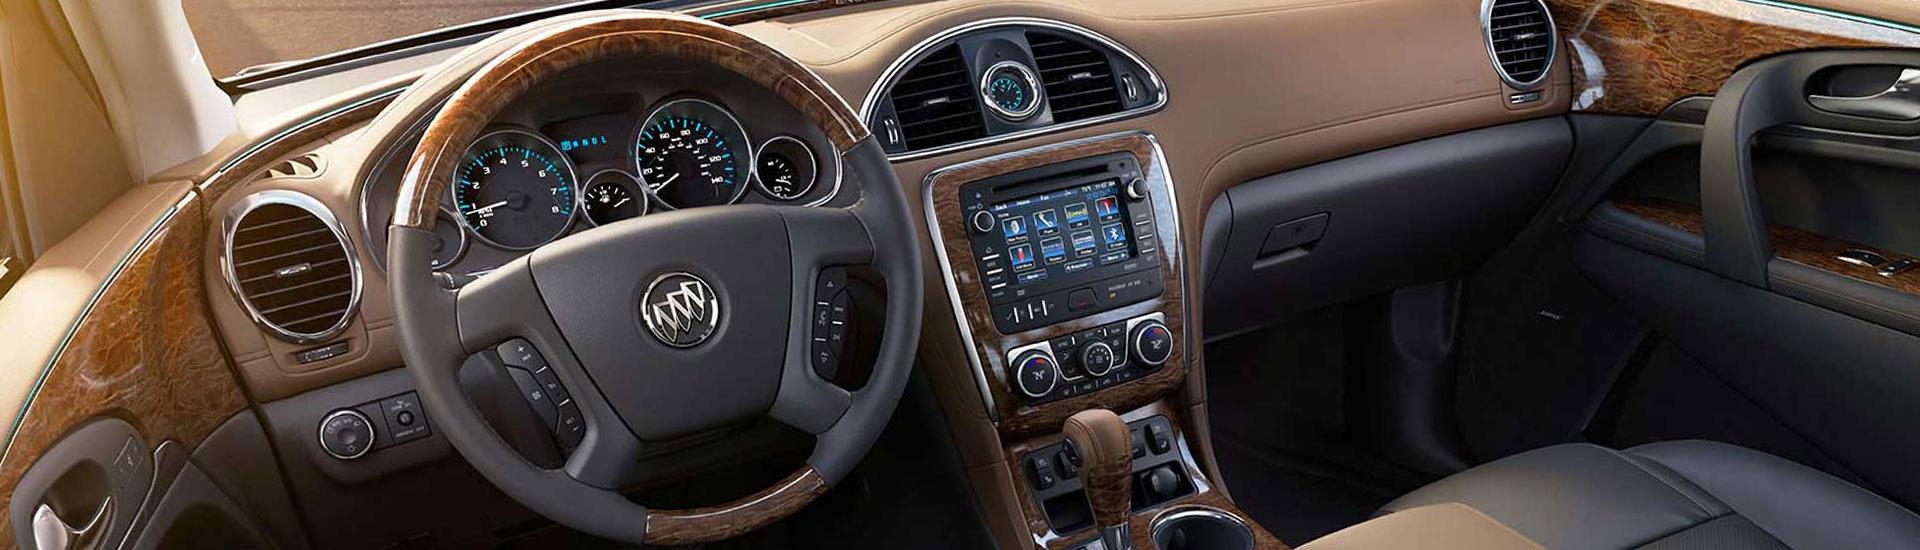 Buick Enclave Dash Kits | Custom Buick Enclave Dash Kit